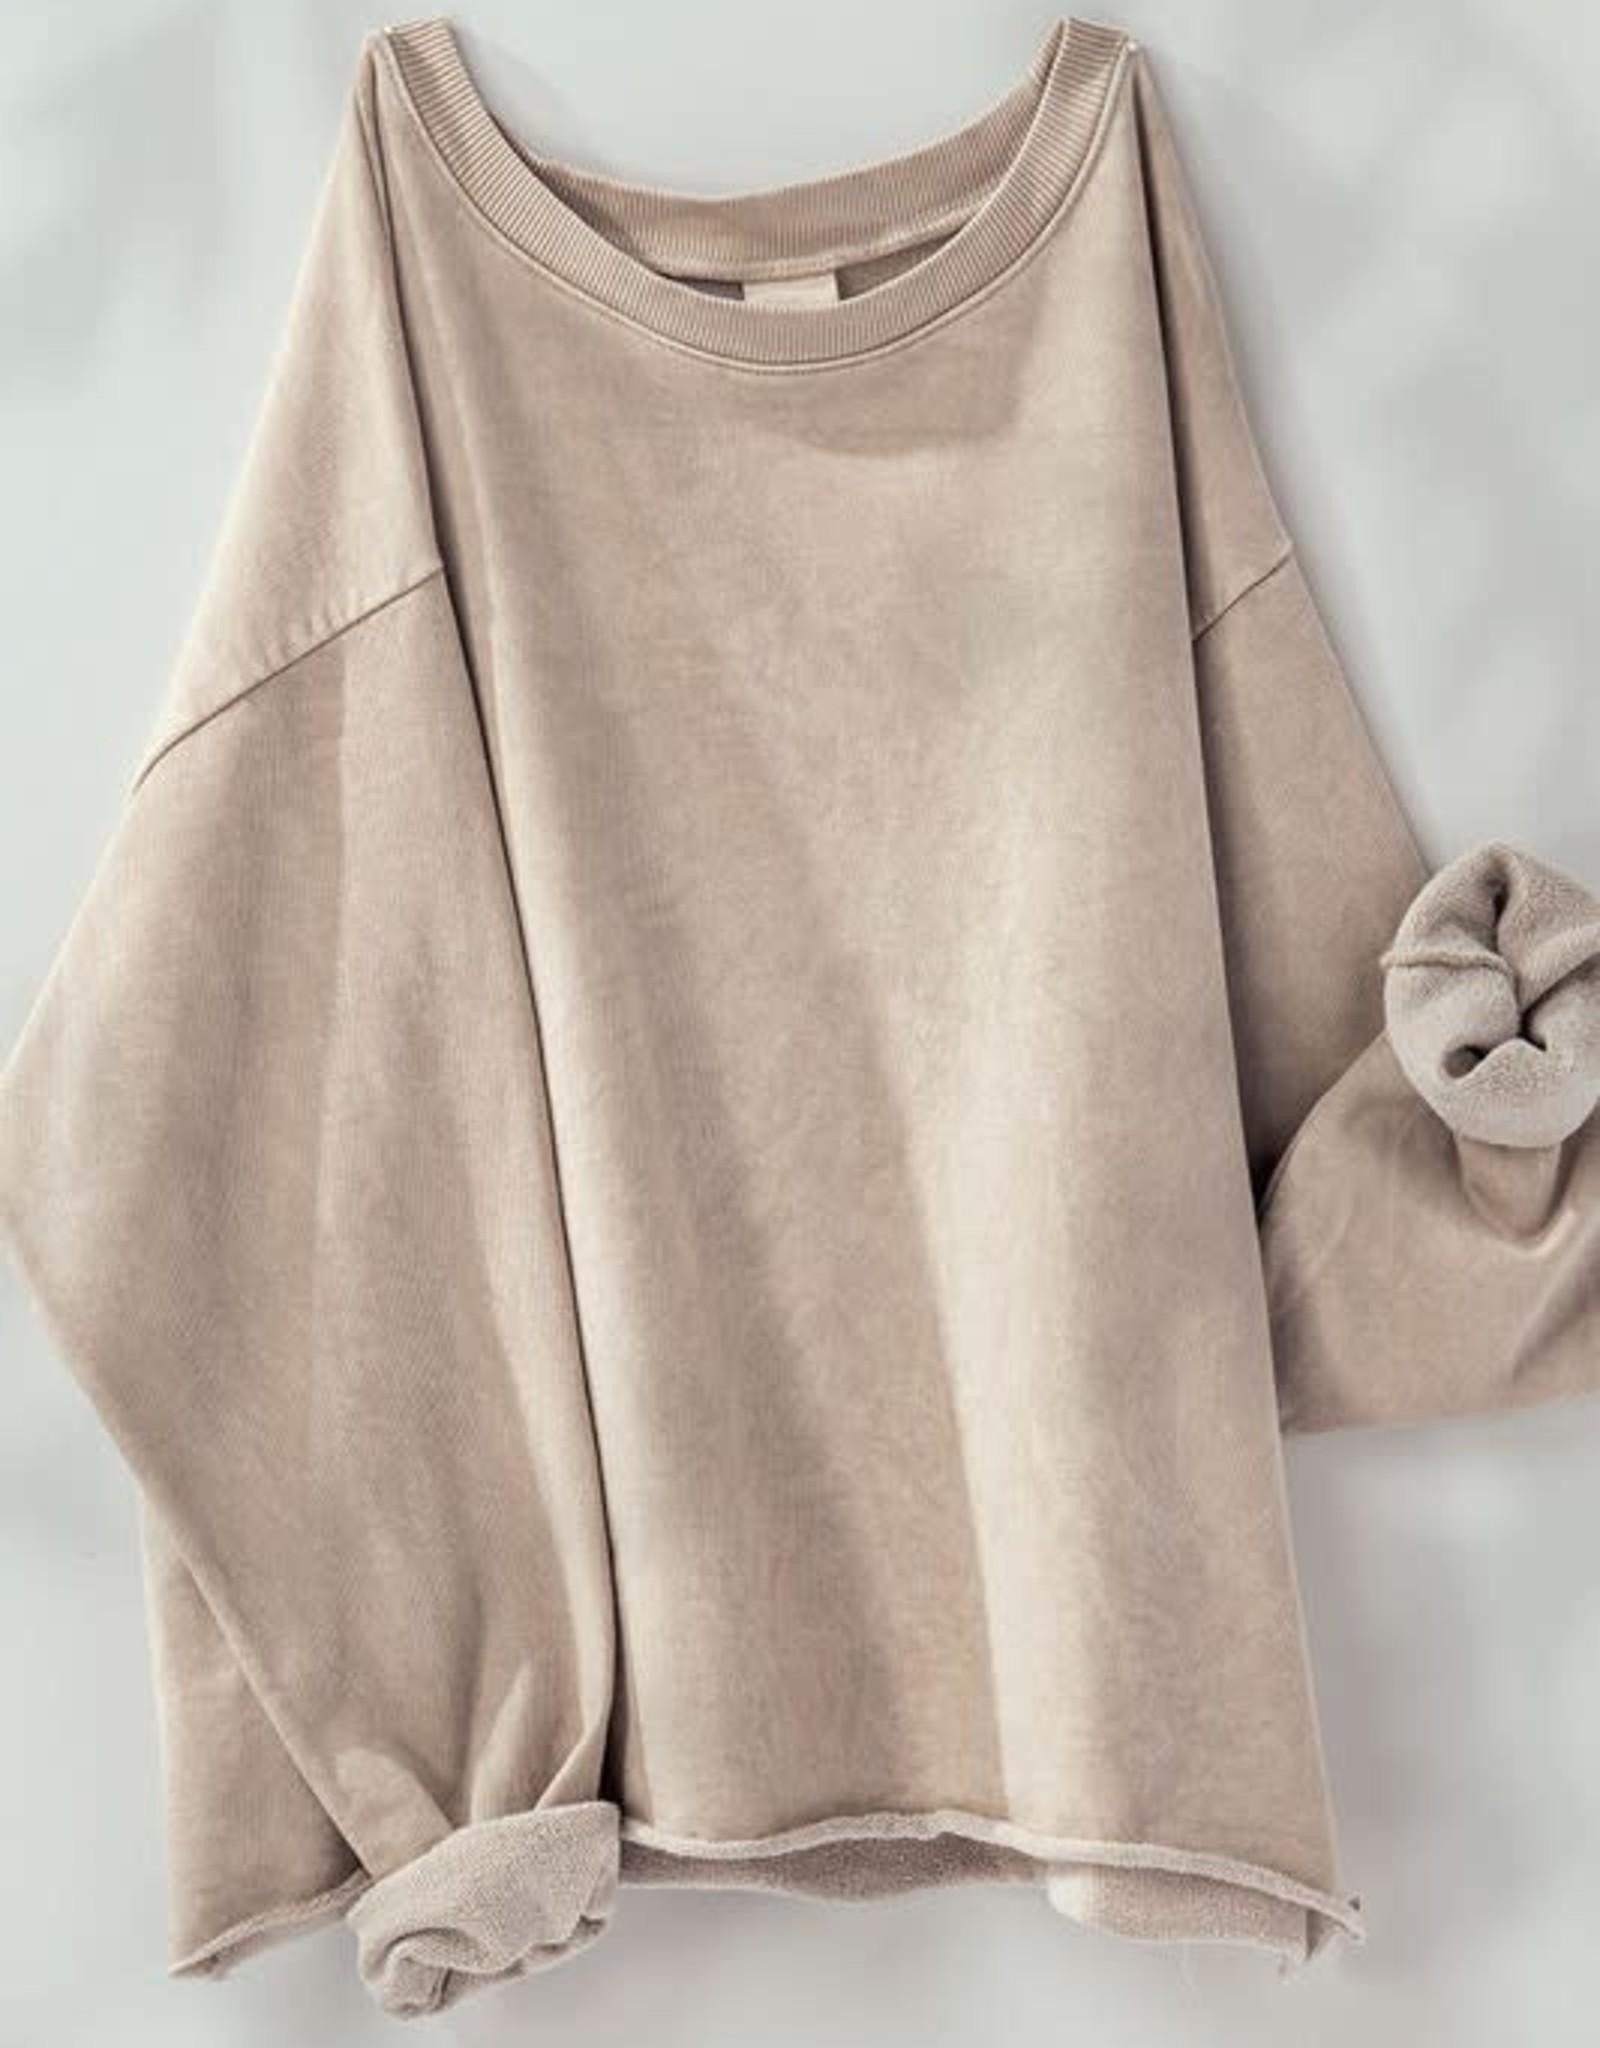 All Night Sweatshirt